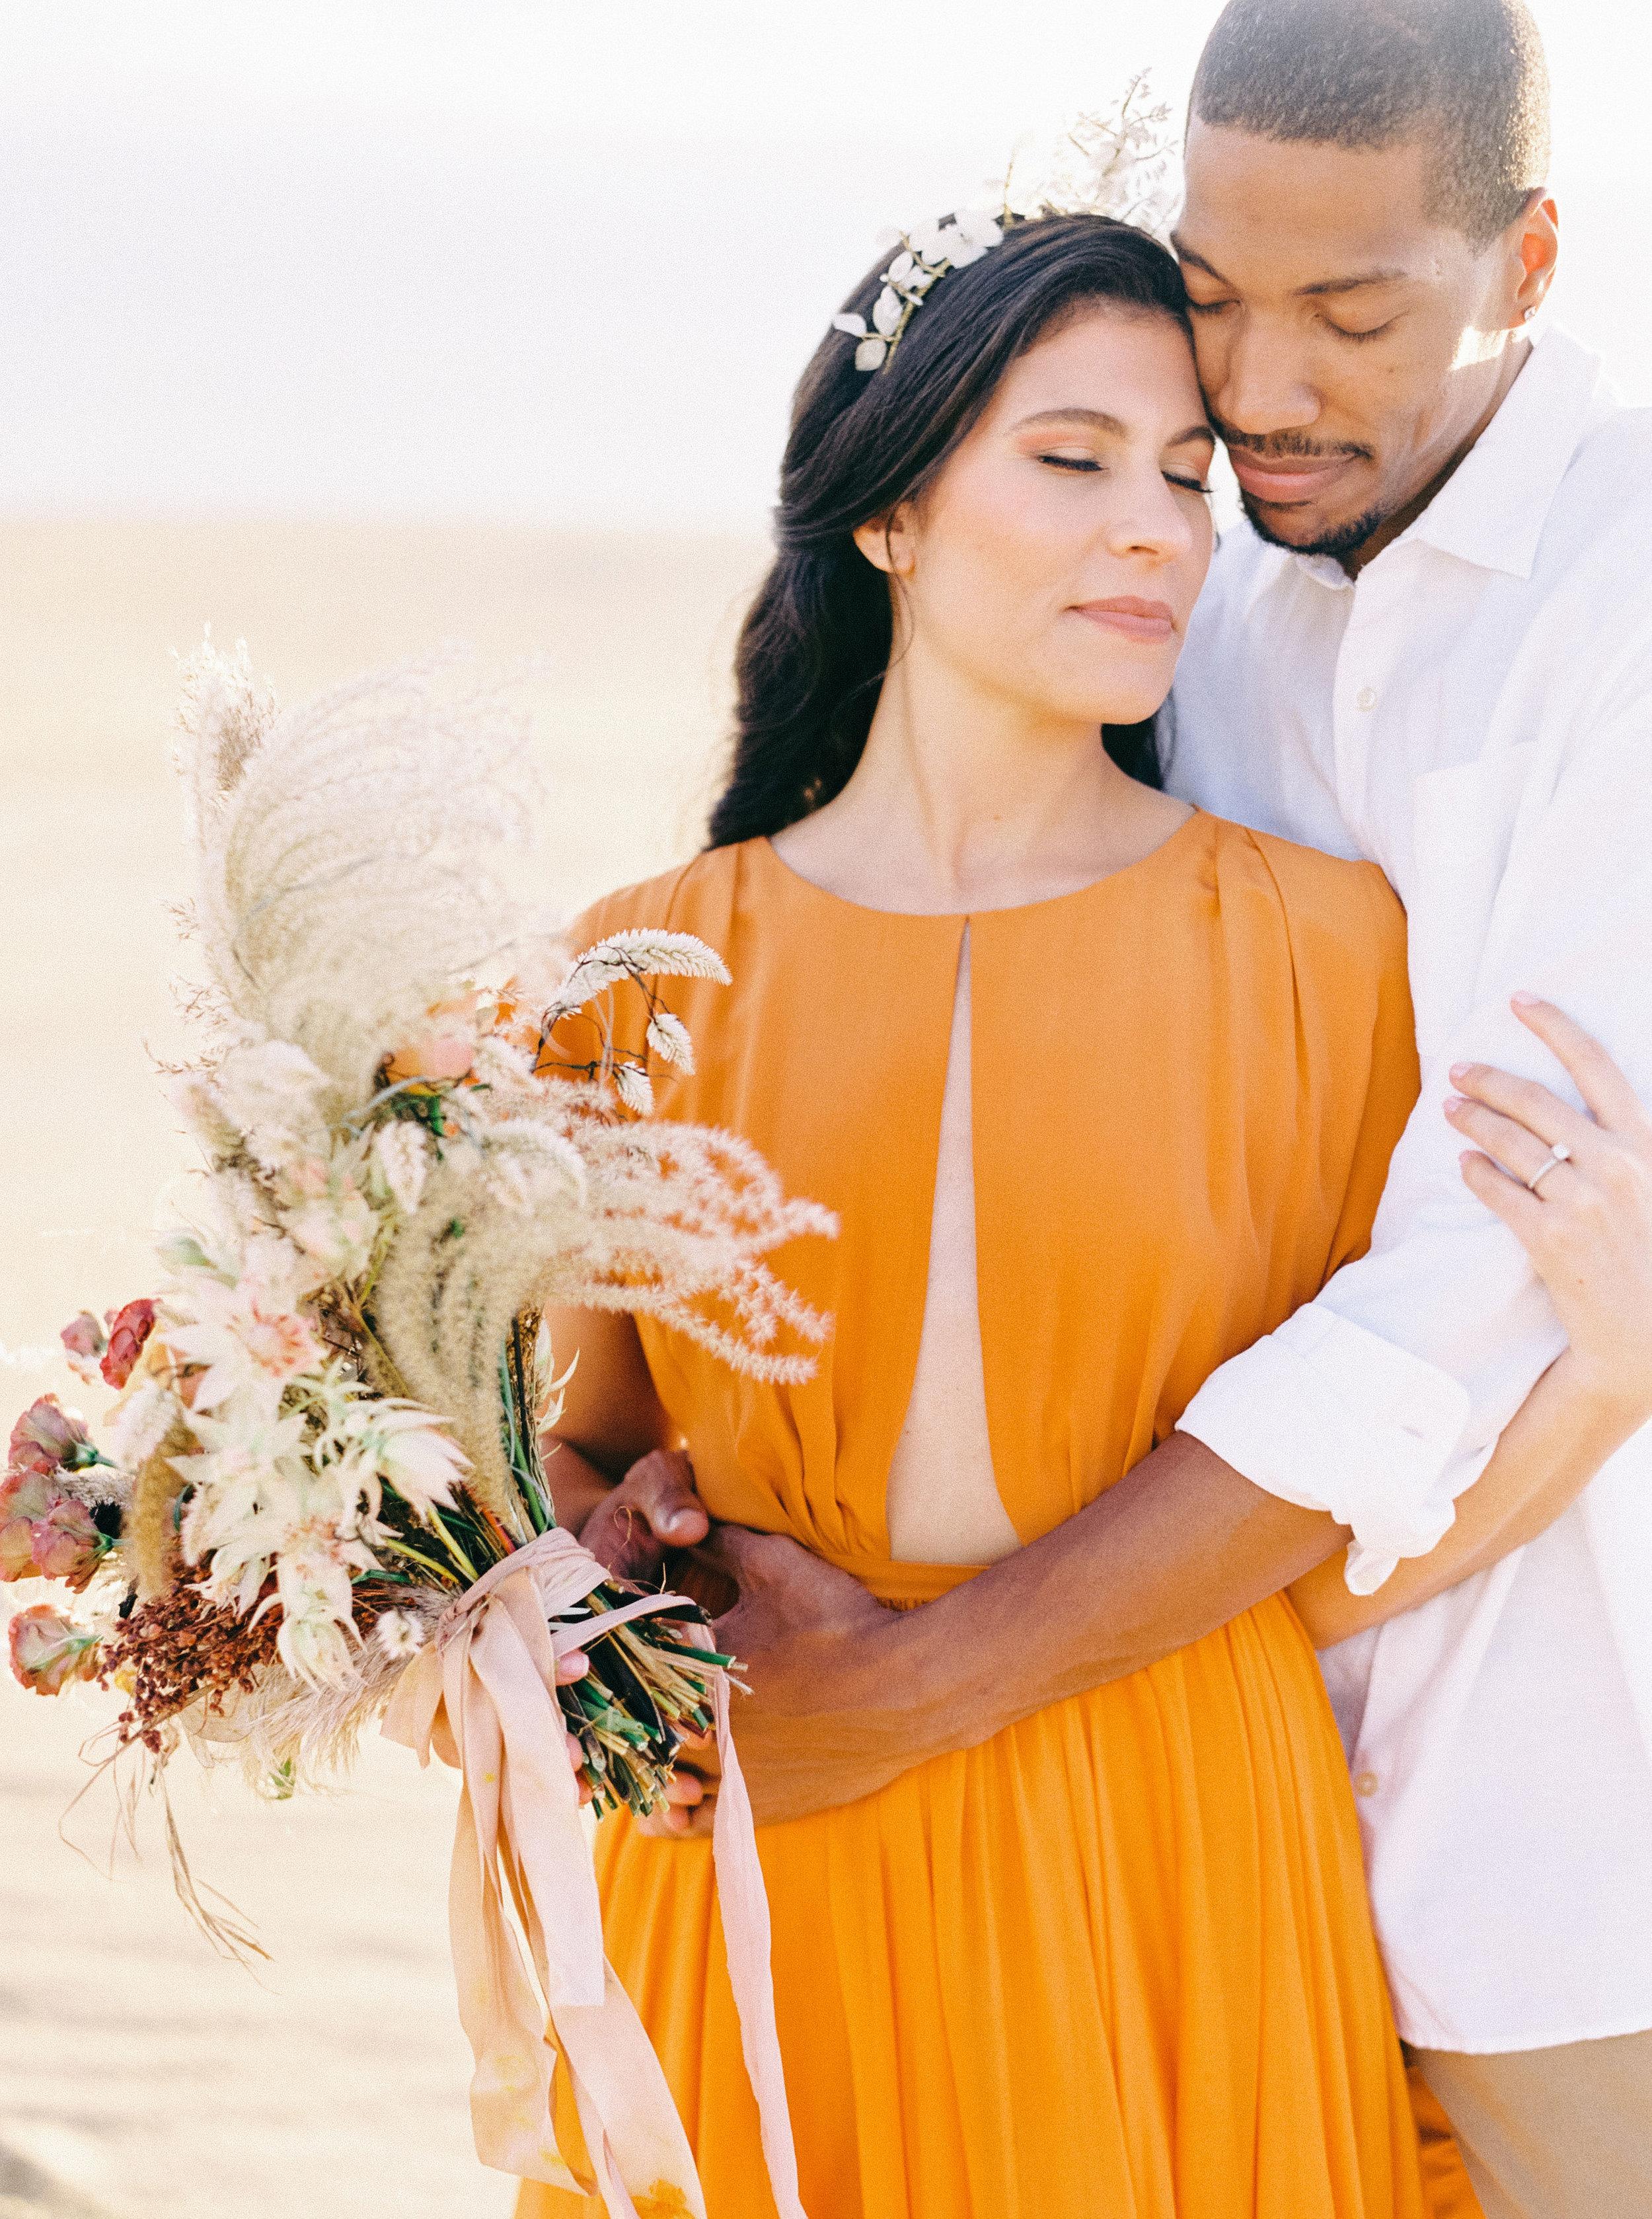 NikkiSanterre_FineArtFilmWeddingPhotographer_WeddingSparrowEditorial_AisleSociety_DesertEngagementSession-6.jpg